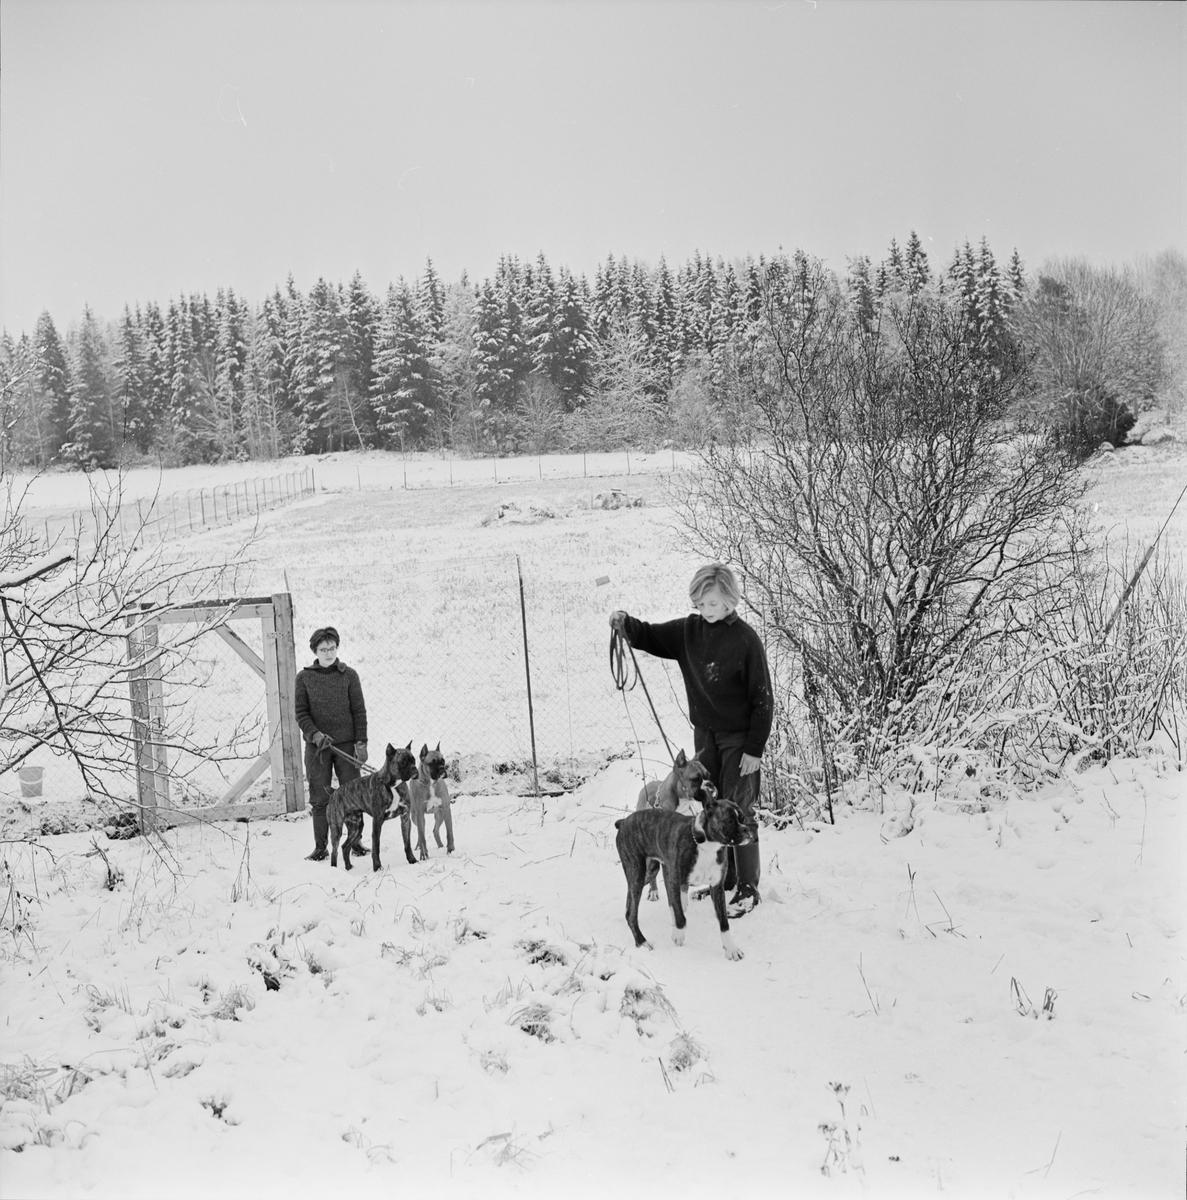 Rastning av boxerhundar, Raggboda hundpensionat, Skyttorp, Uppland 1962